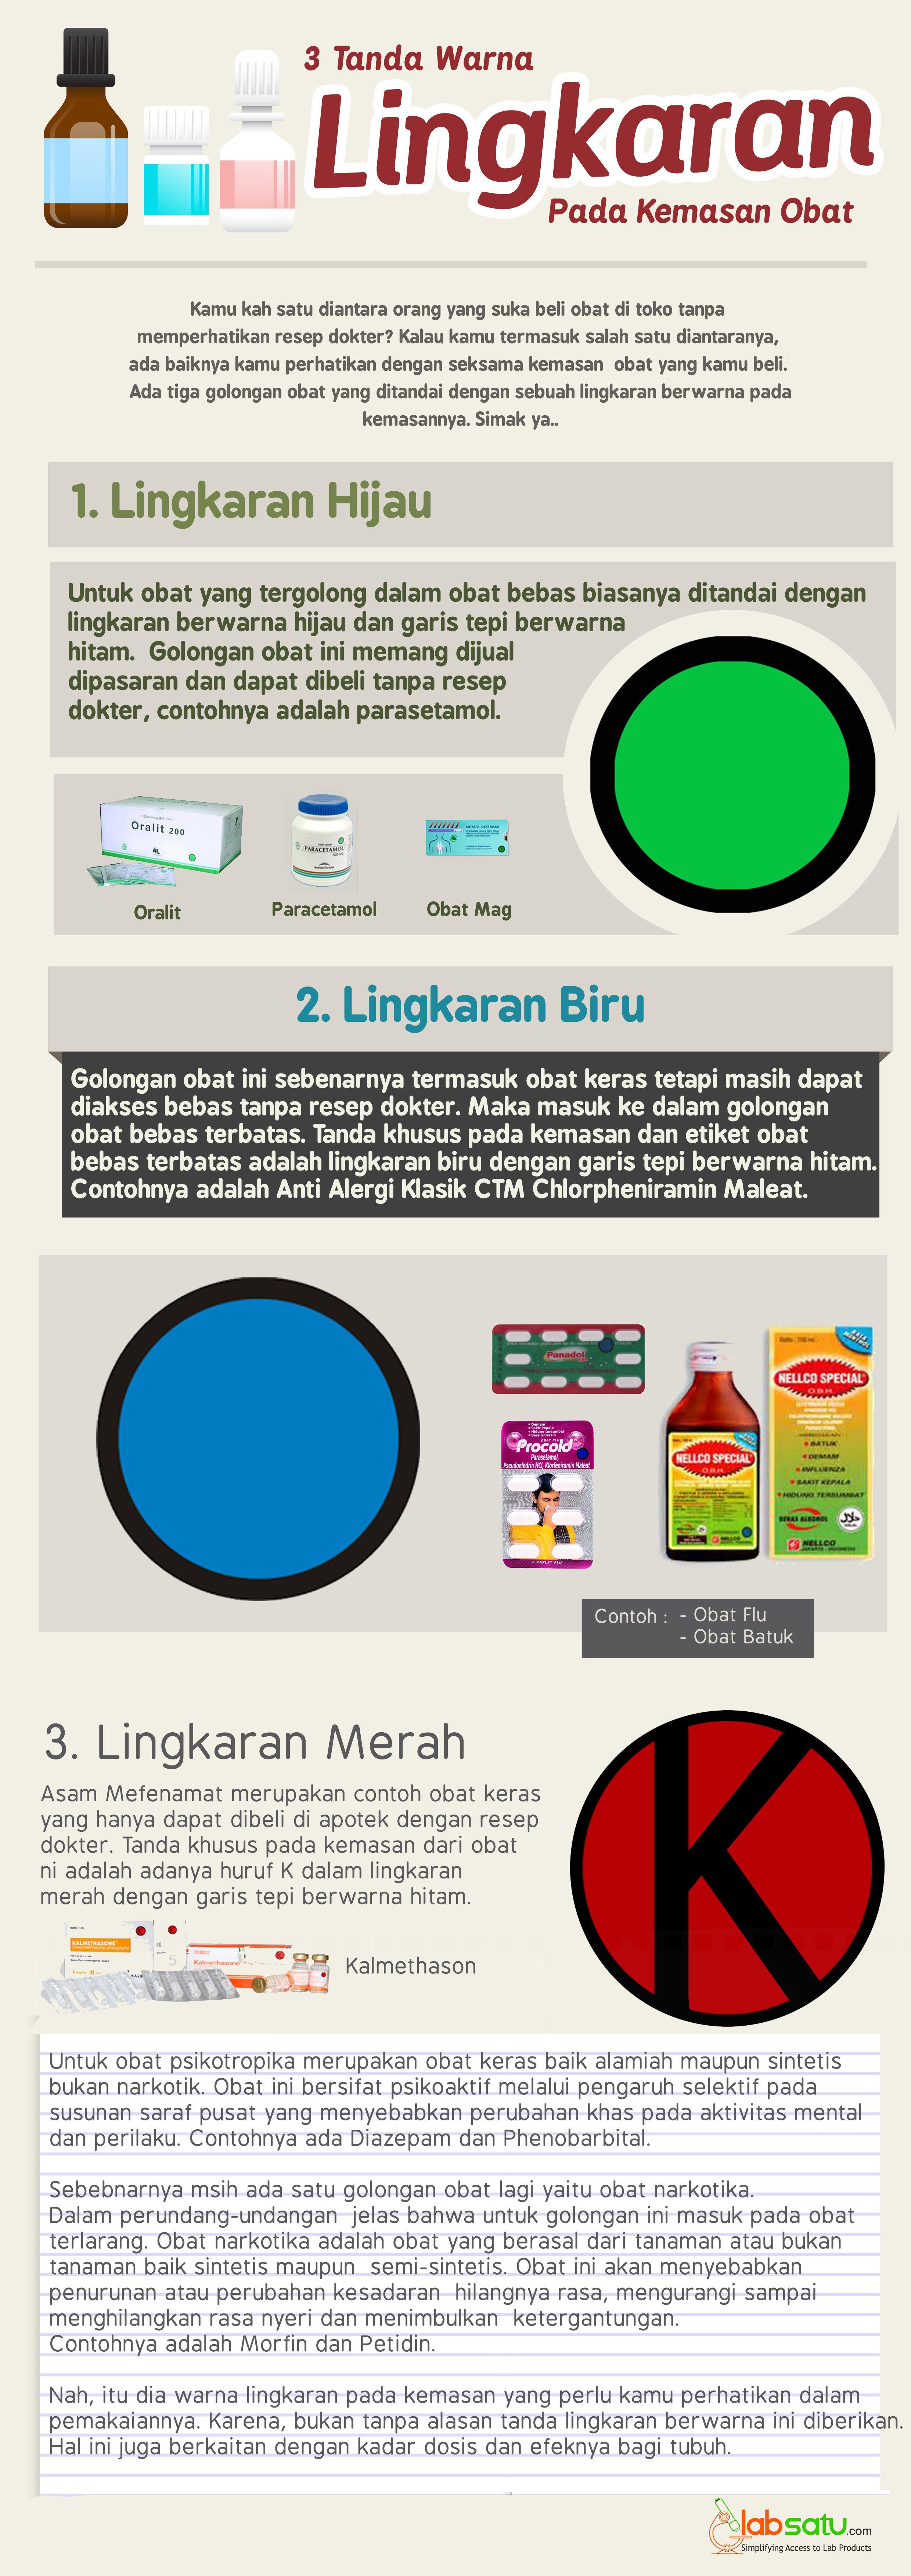 tanda warna lingkaran pada obat